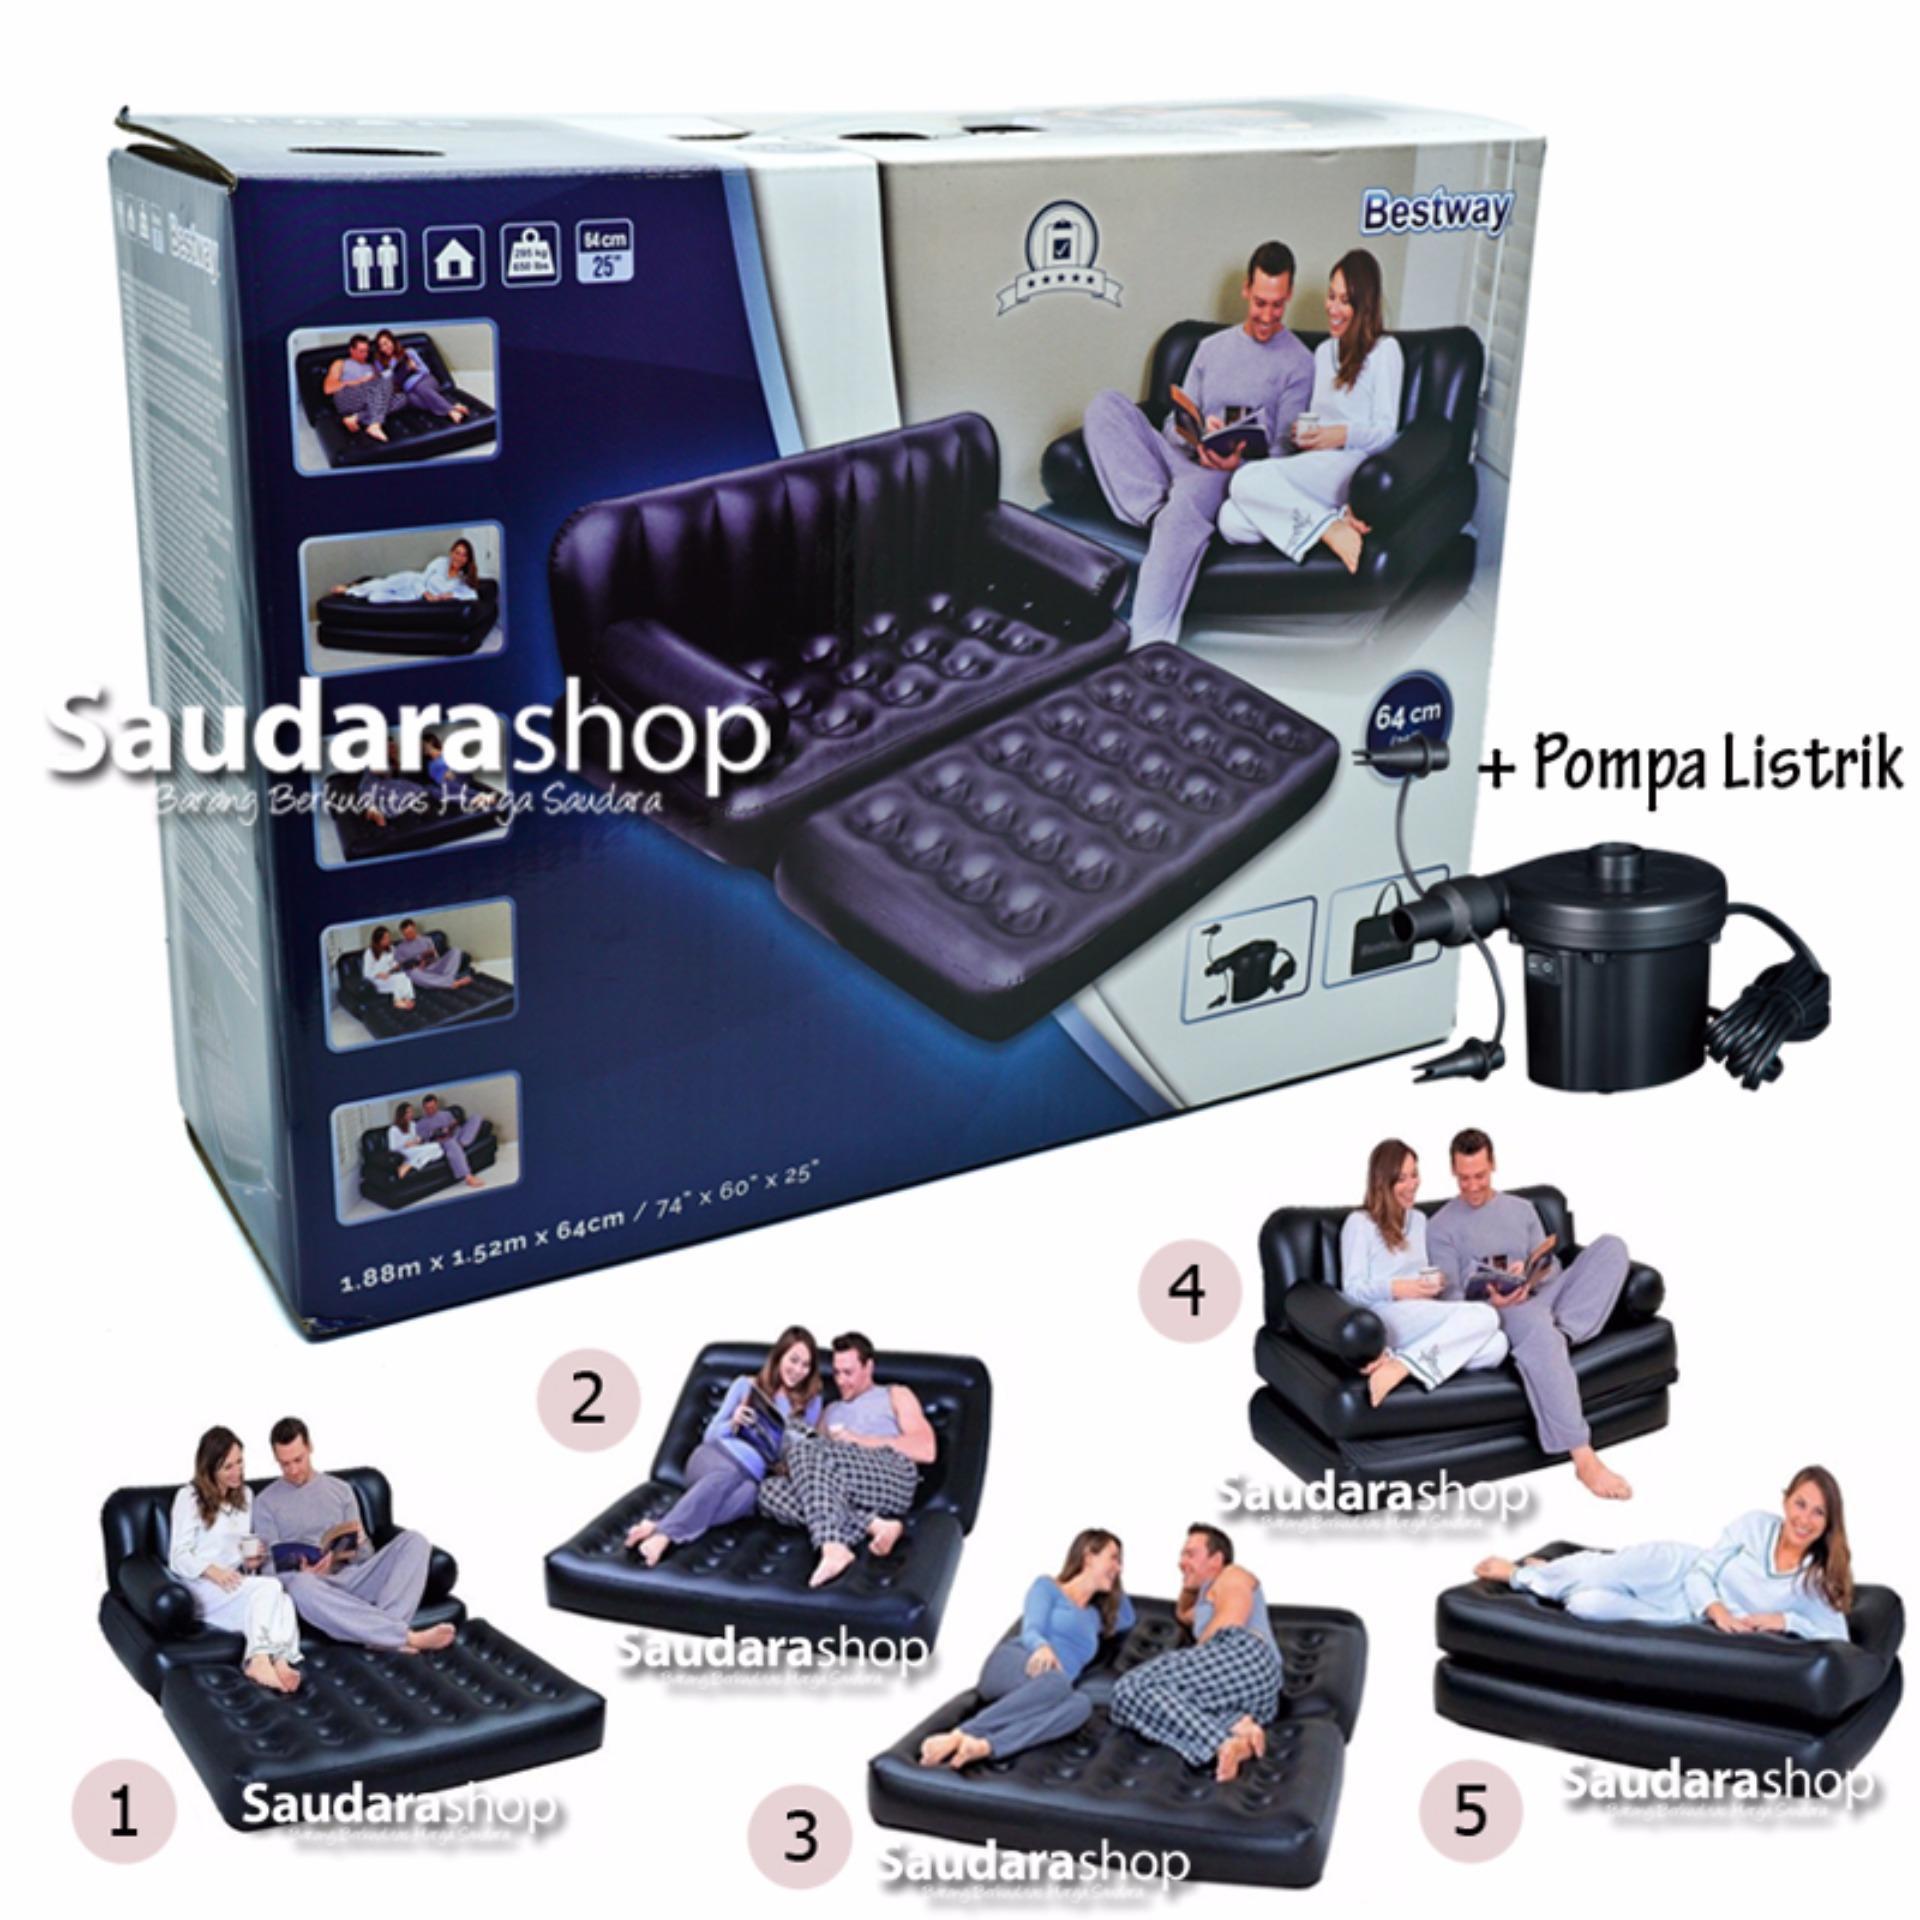 Spesifikasi Bestway 75056 Sofa Bed 5 In 1 Sofa Bed Multifunction 5 In 1 Sofa Bed 5In1 Yg Baik